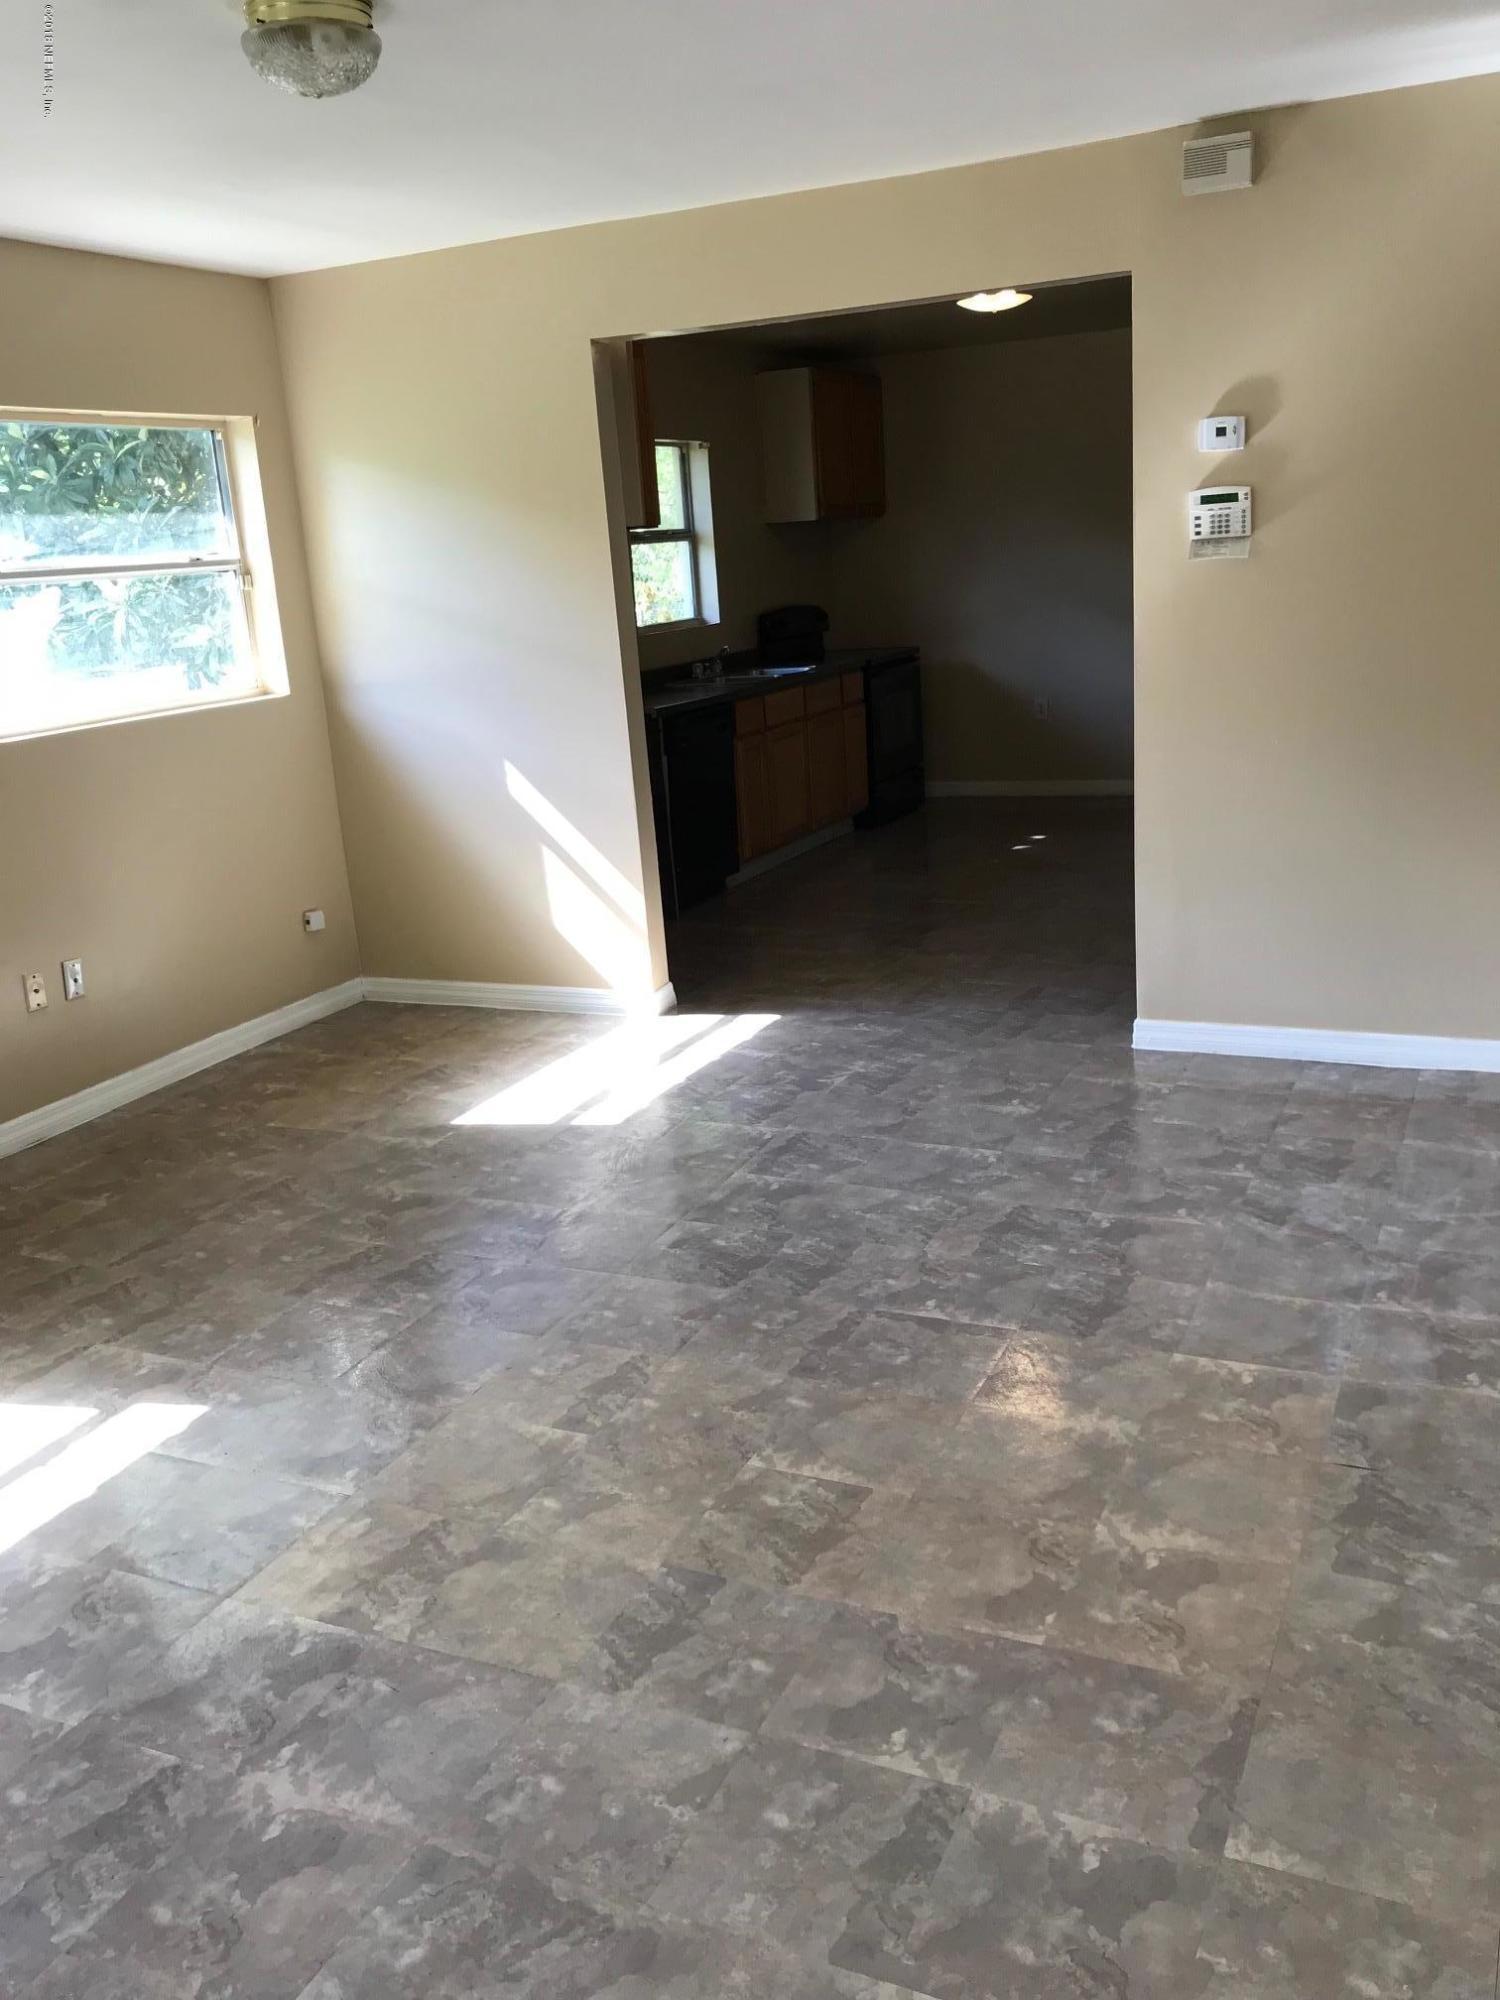 208 HARRIS, PALATKA, FLORIDA 32177, 3 Bedrooms Bedrooms, ,1 BathroomBathrooms,Residential - single family,For sale,HARRIS,935148